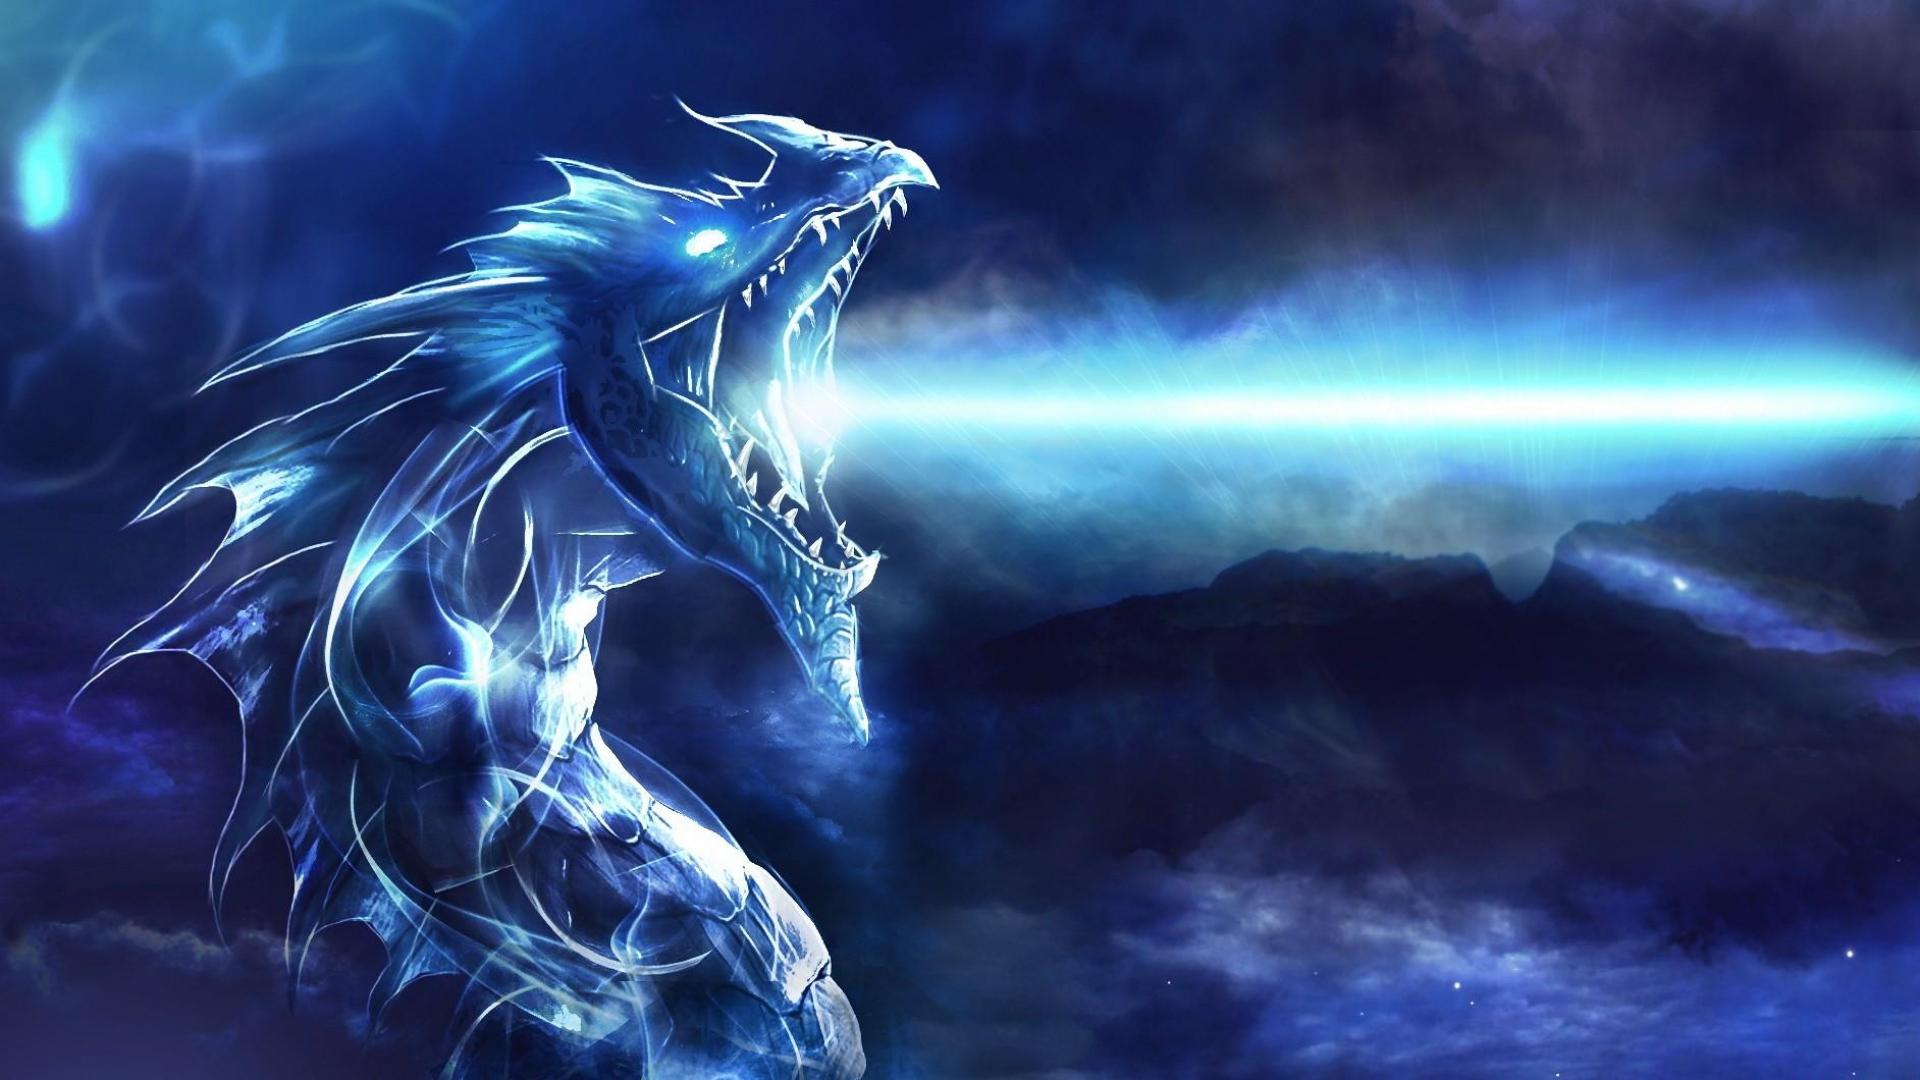 Cool Wallpaper Night Dragon - dragon_mouth_night_light_63102_1920x1080  Graphic.jpg